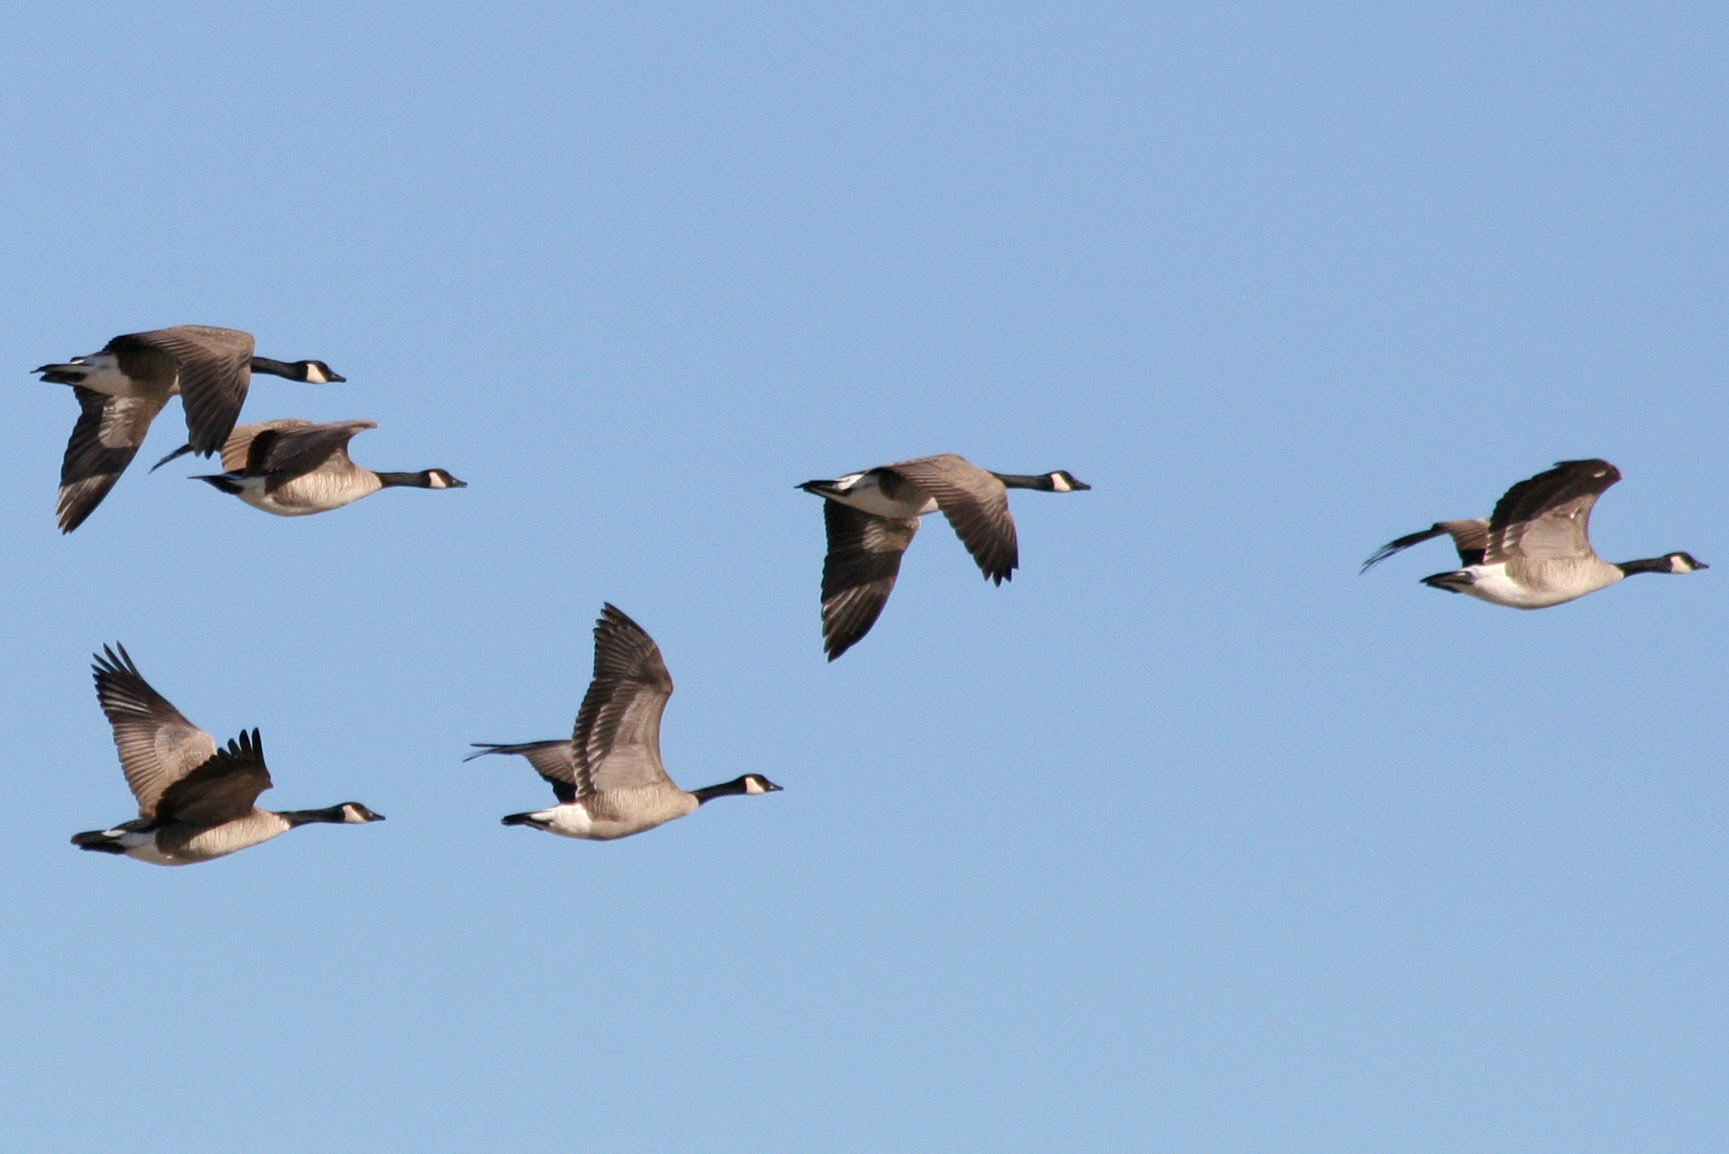 http://nathistoc.bio.uci.edu/birds/anseriformes/Branta%20canadensis/Canada%20Geese,%20V-formation.jpg